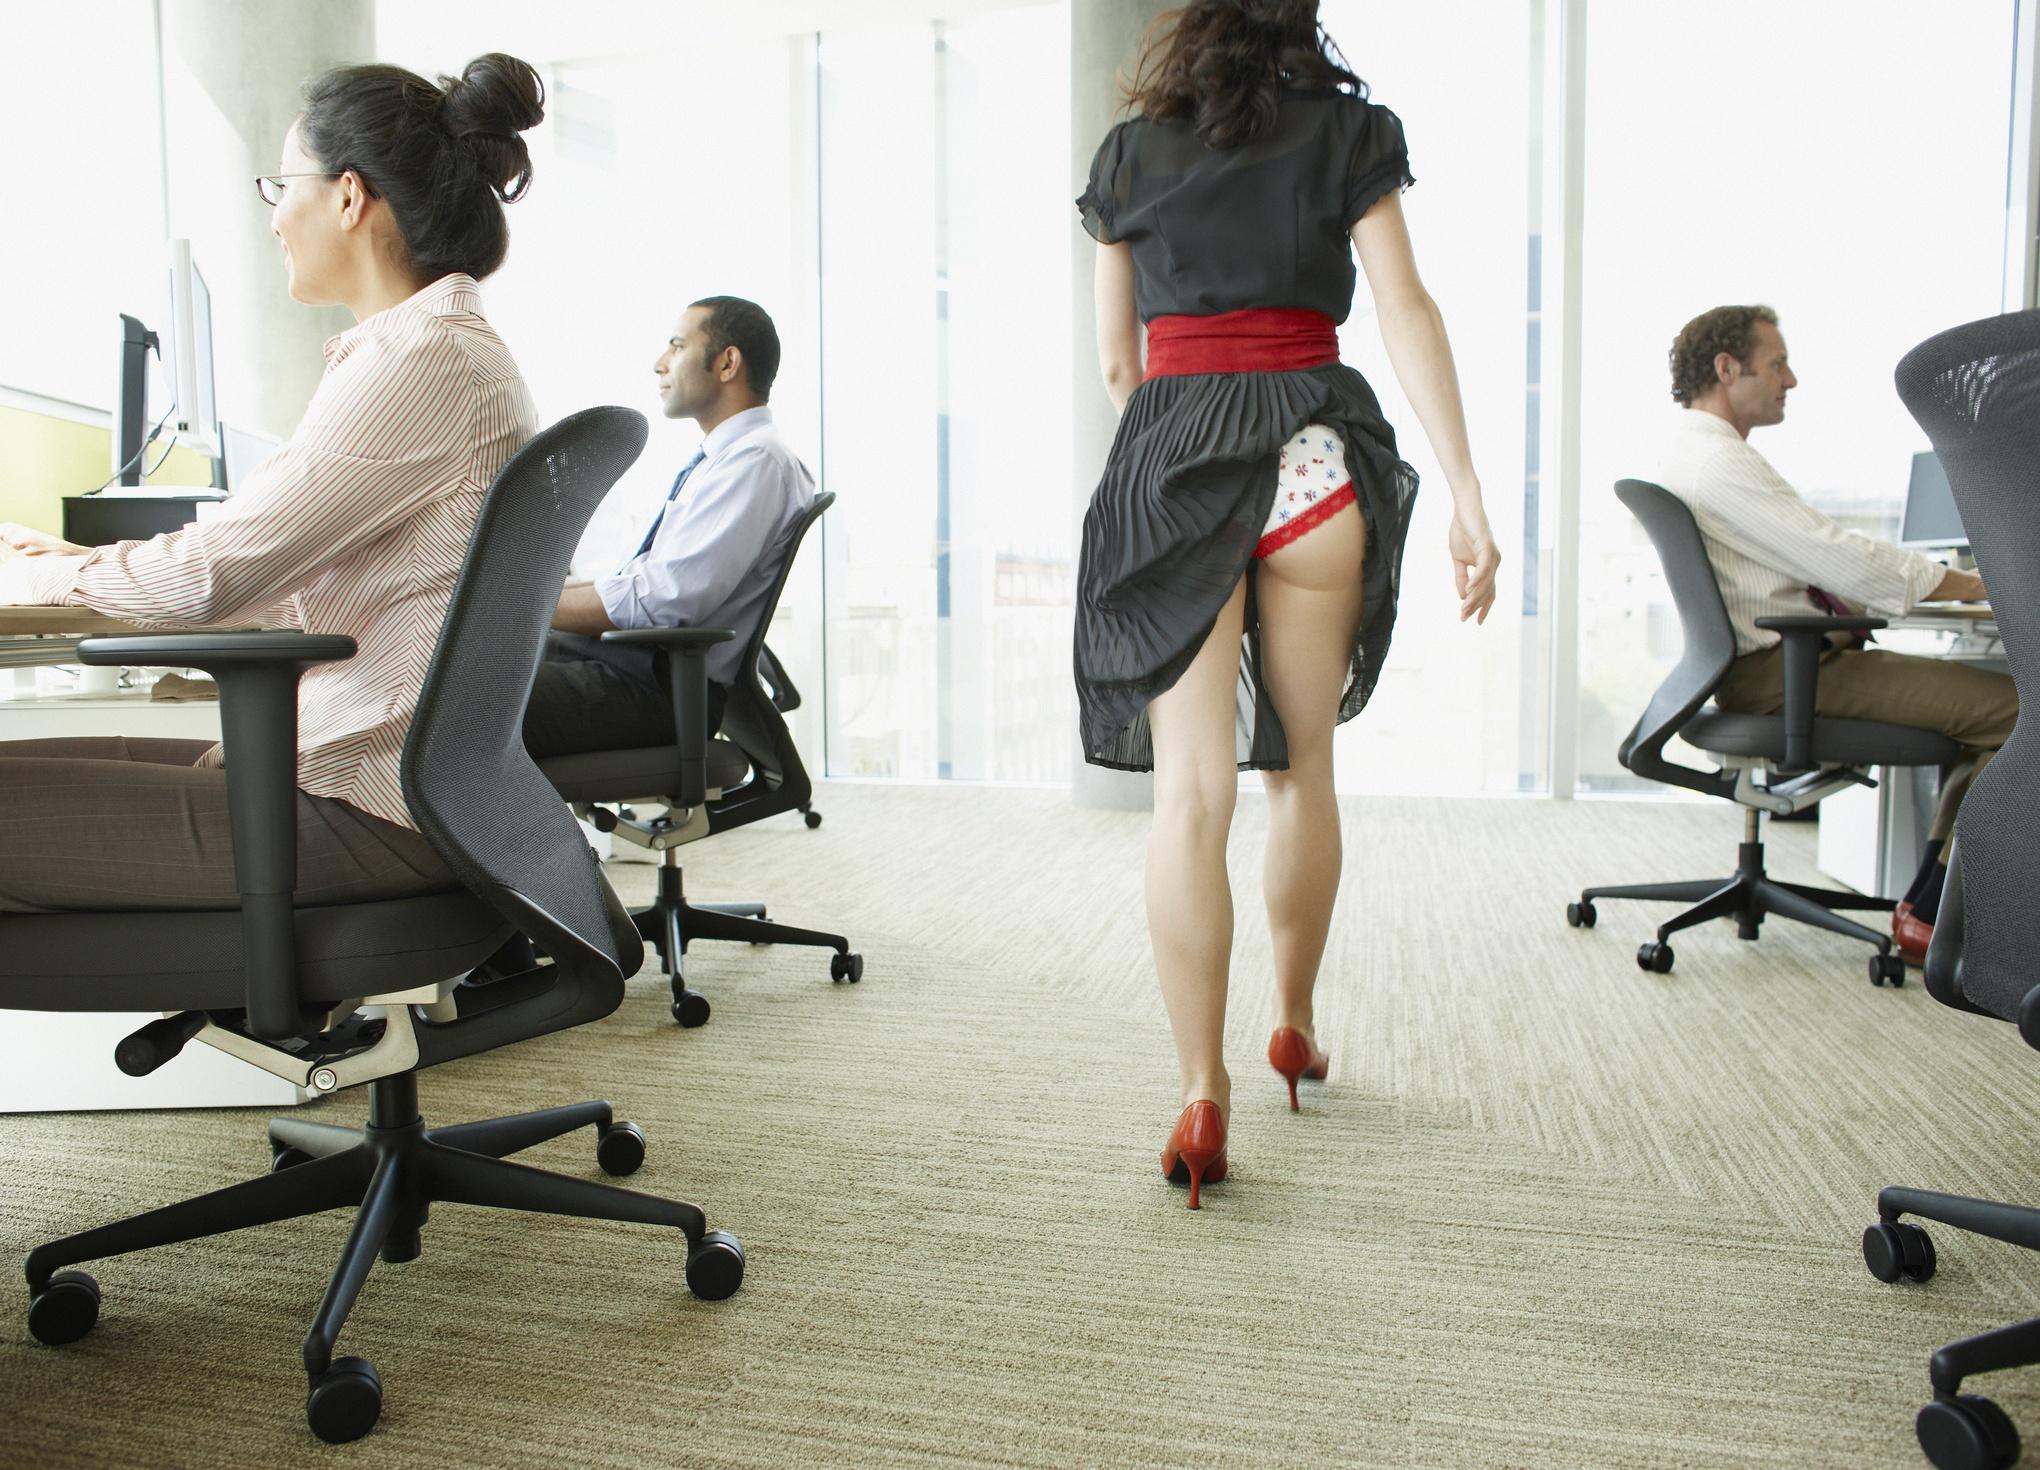 Businesswoman with wardrobe malfuntction